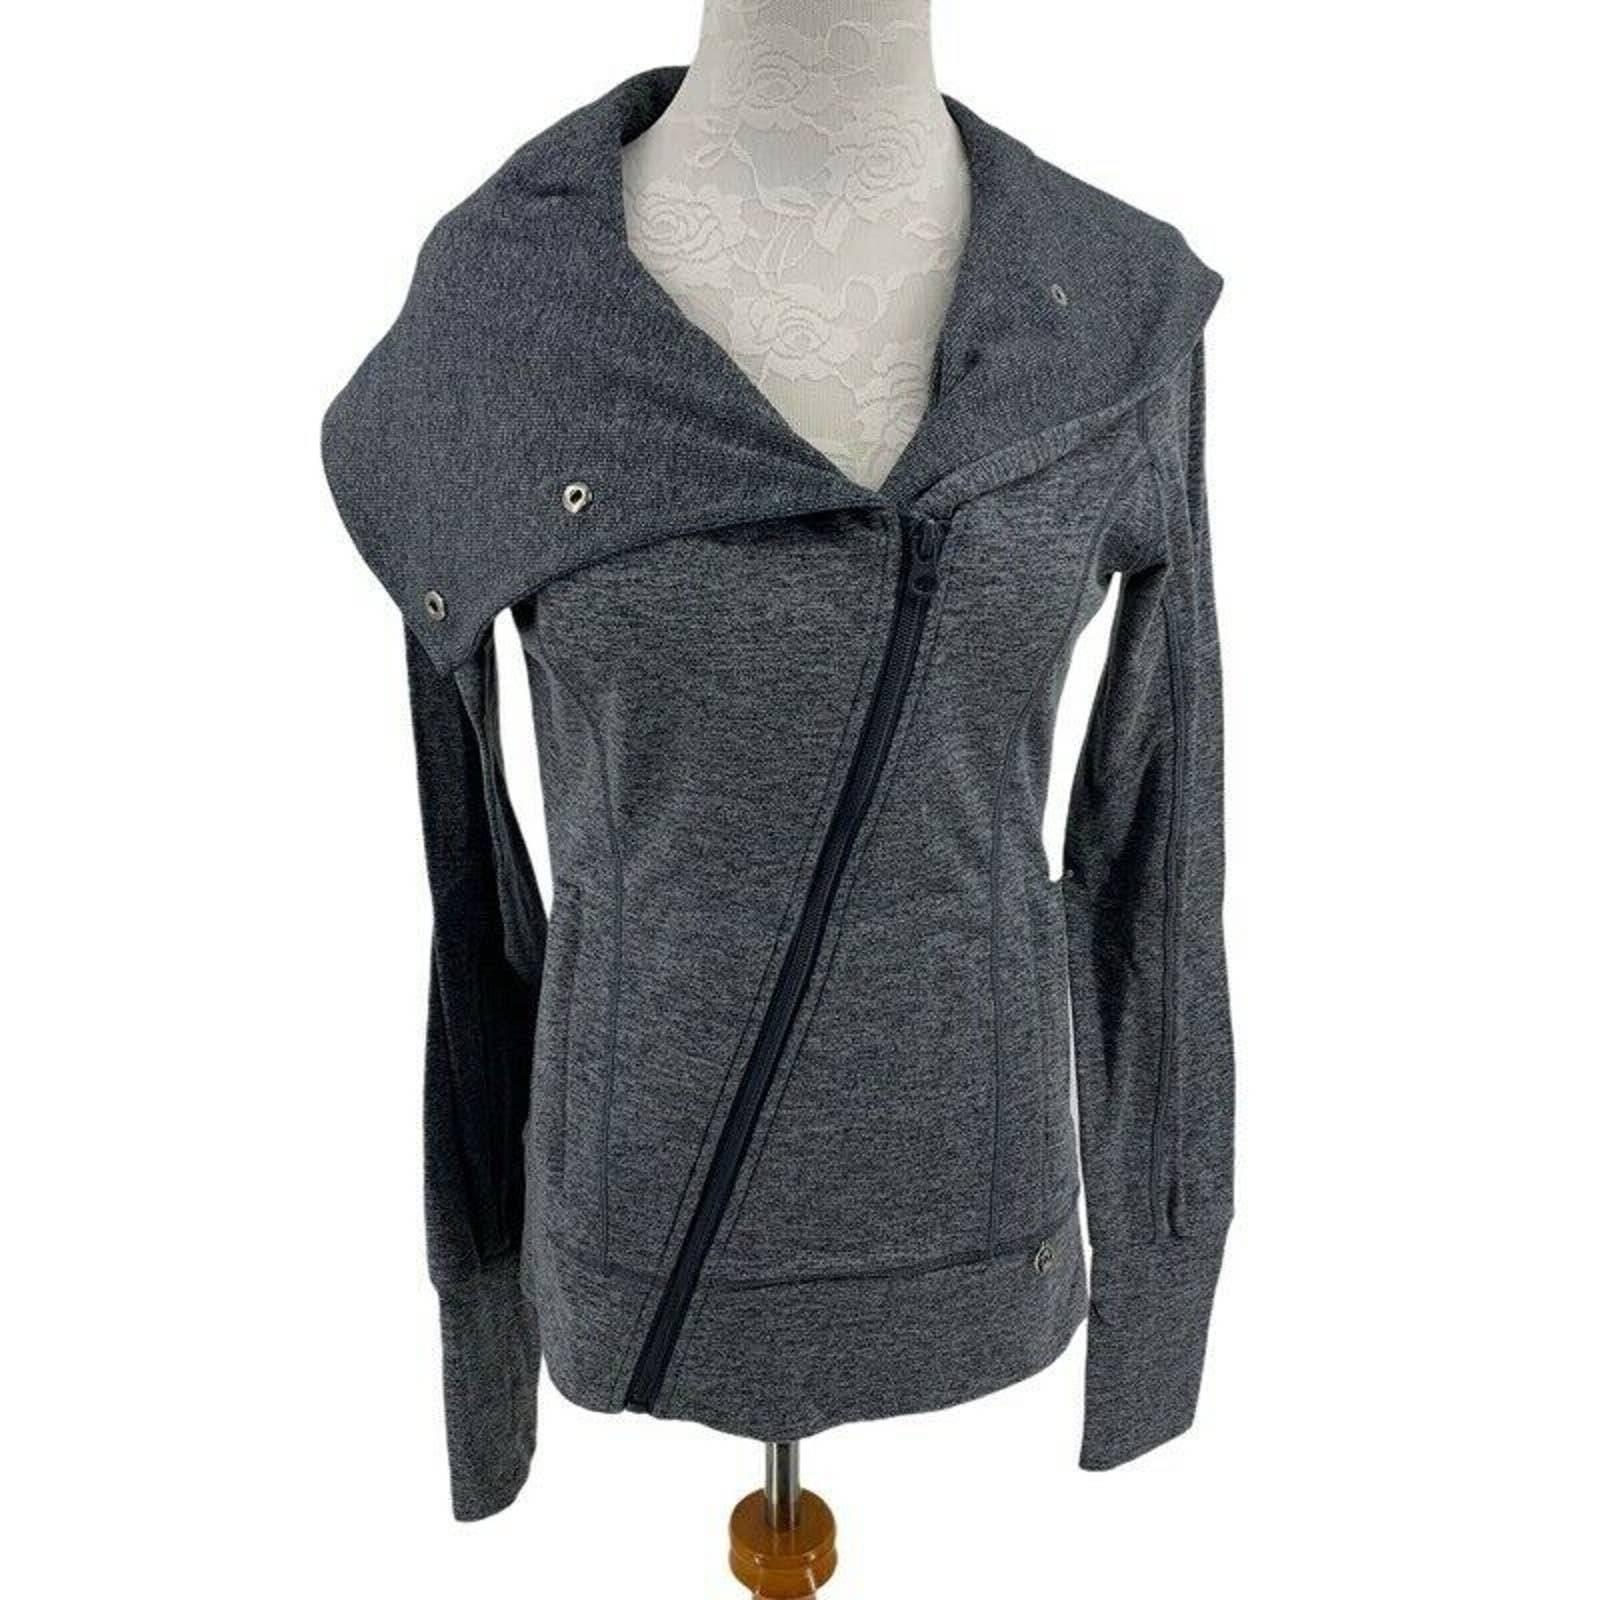 Lorna Jane Christie Excel Zip Jacket XS